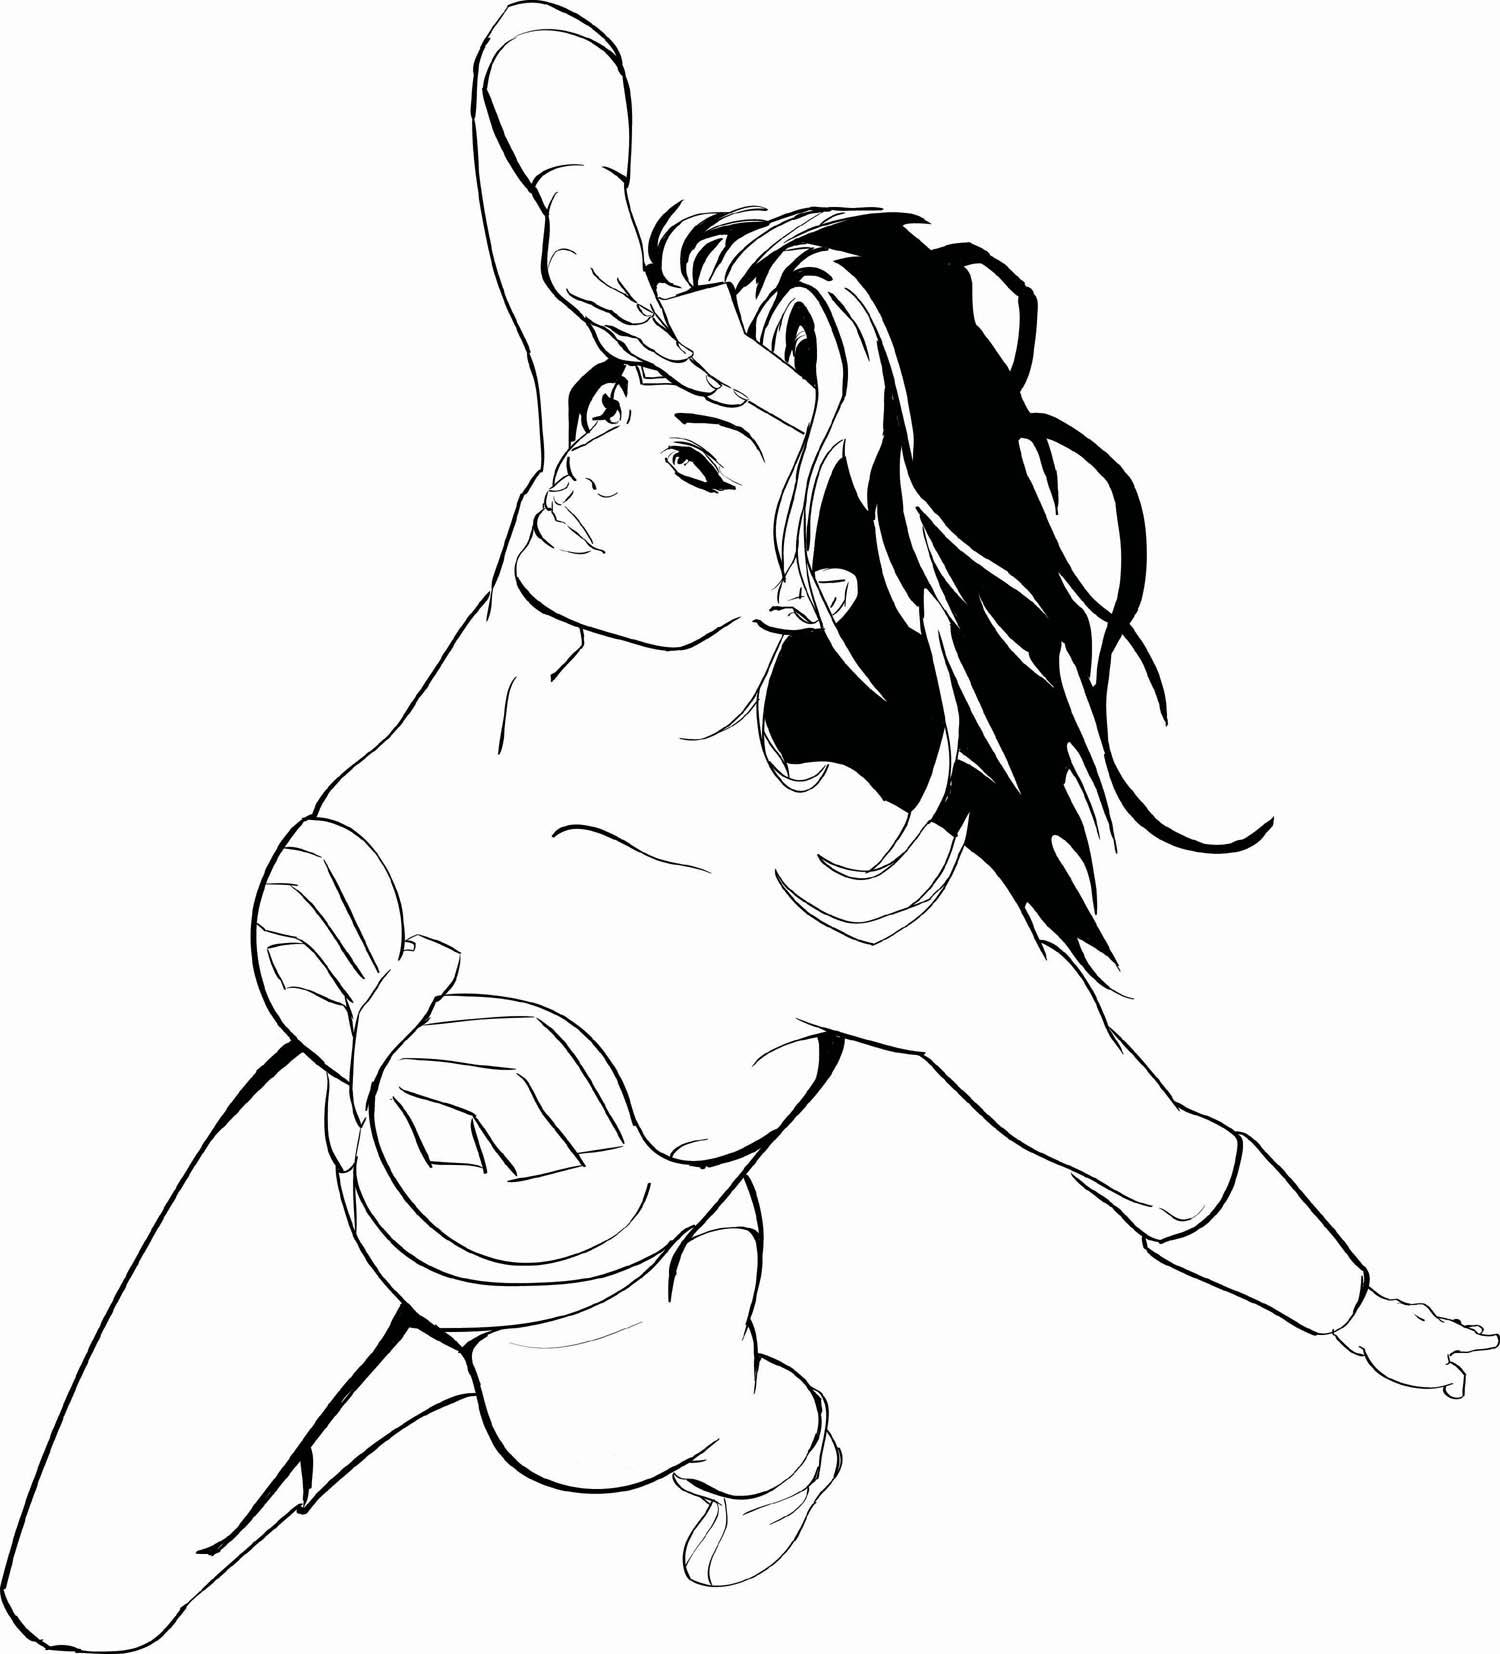 Wonderwoman Drawing at GetDrawings.com   Free for personal use ...